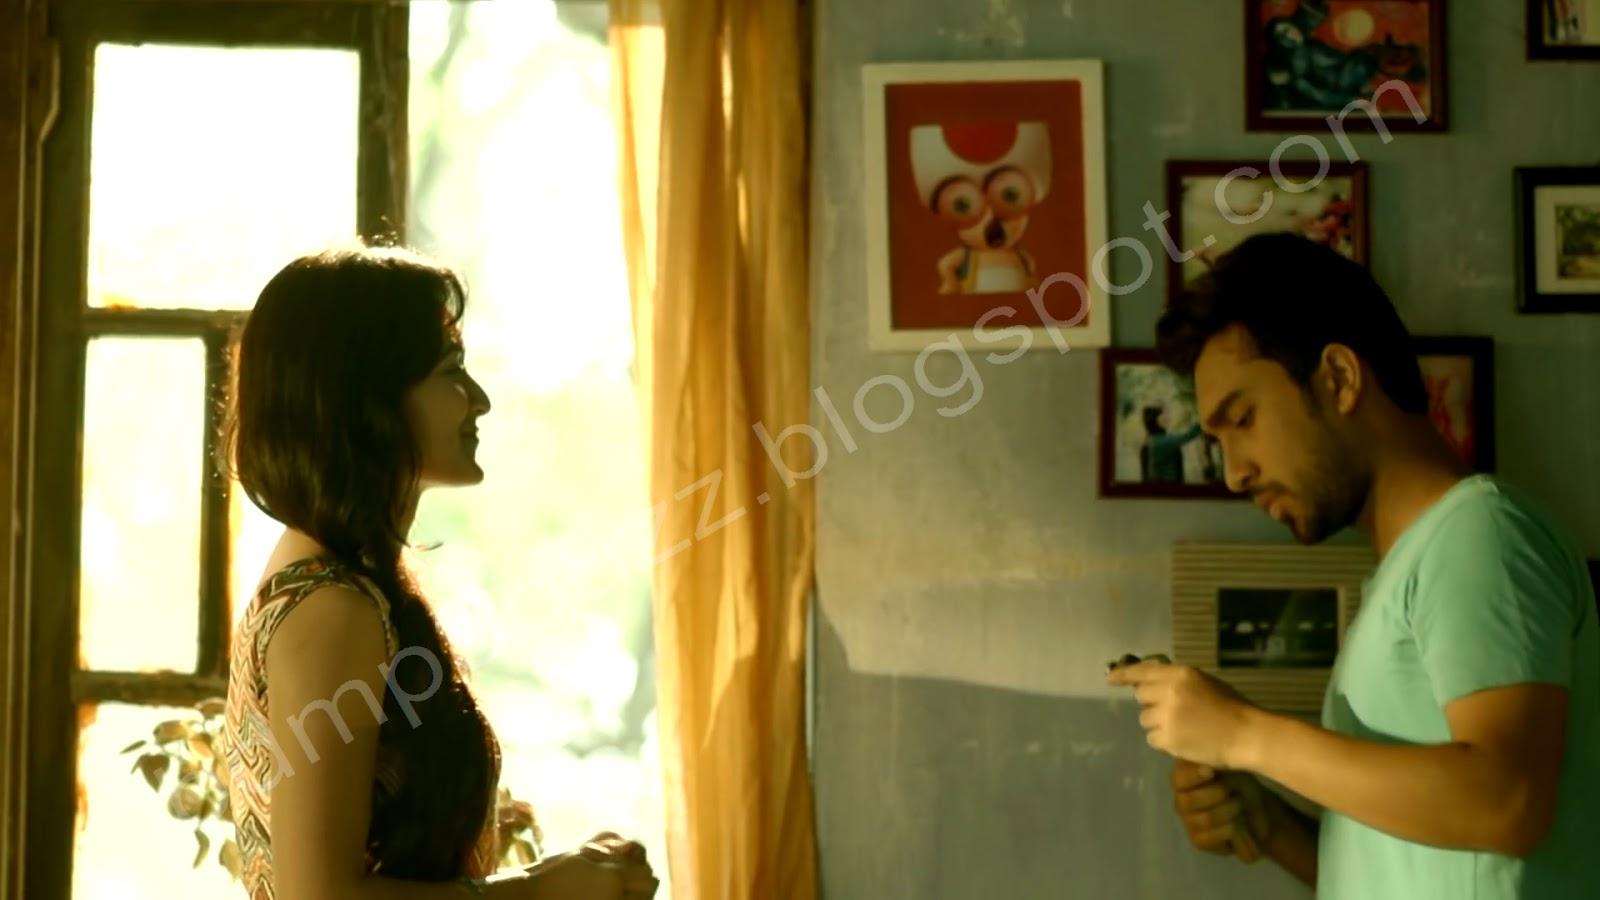 Ichchey Manush New Video Song Shawon Gaanwalanew Bangla Song Ichchey Manush